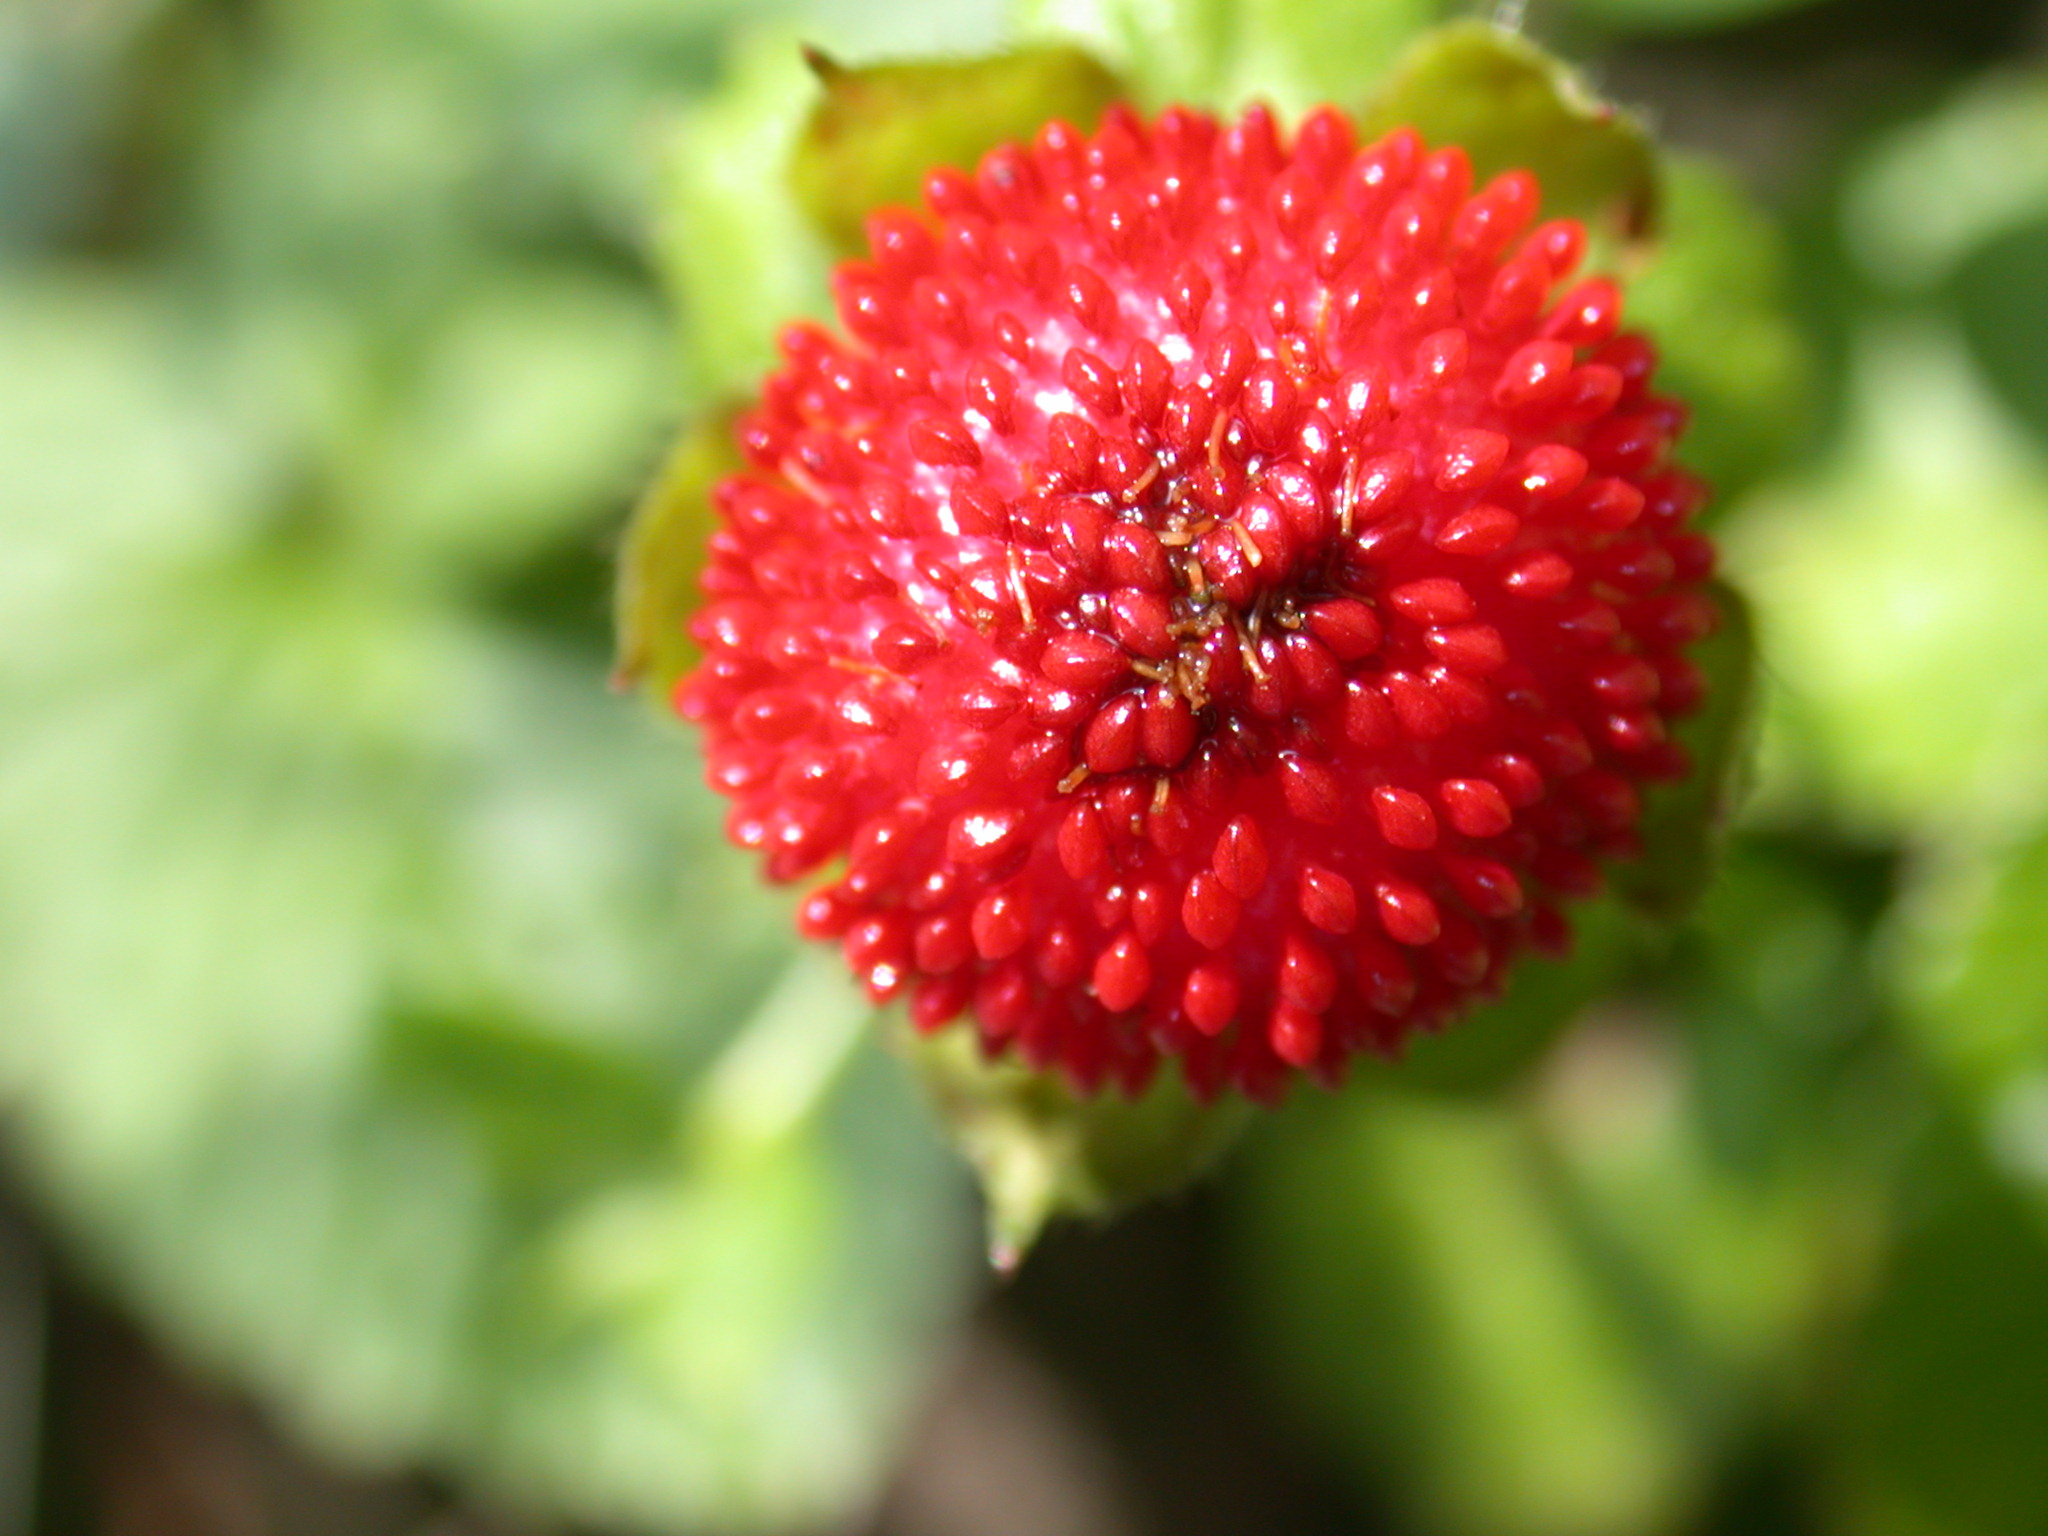 image.php?image=b6nature_plants001.jpg&dl=1